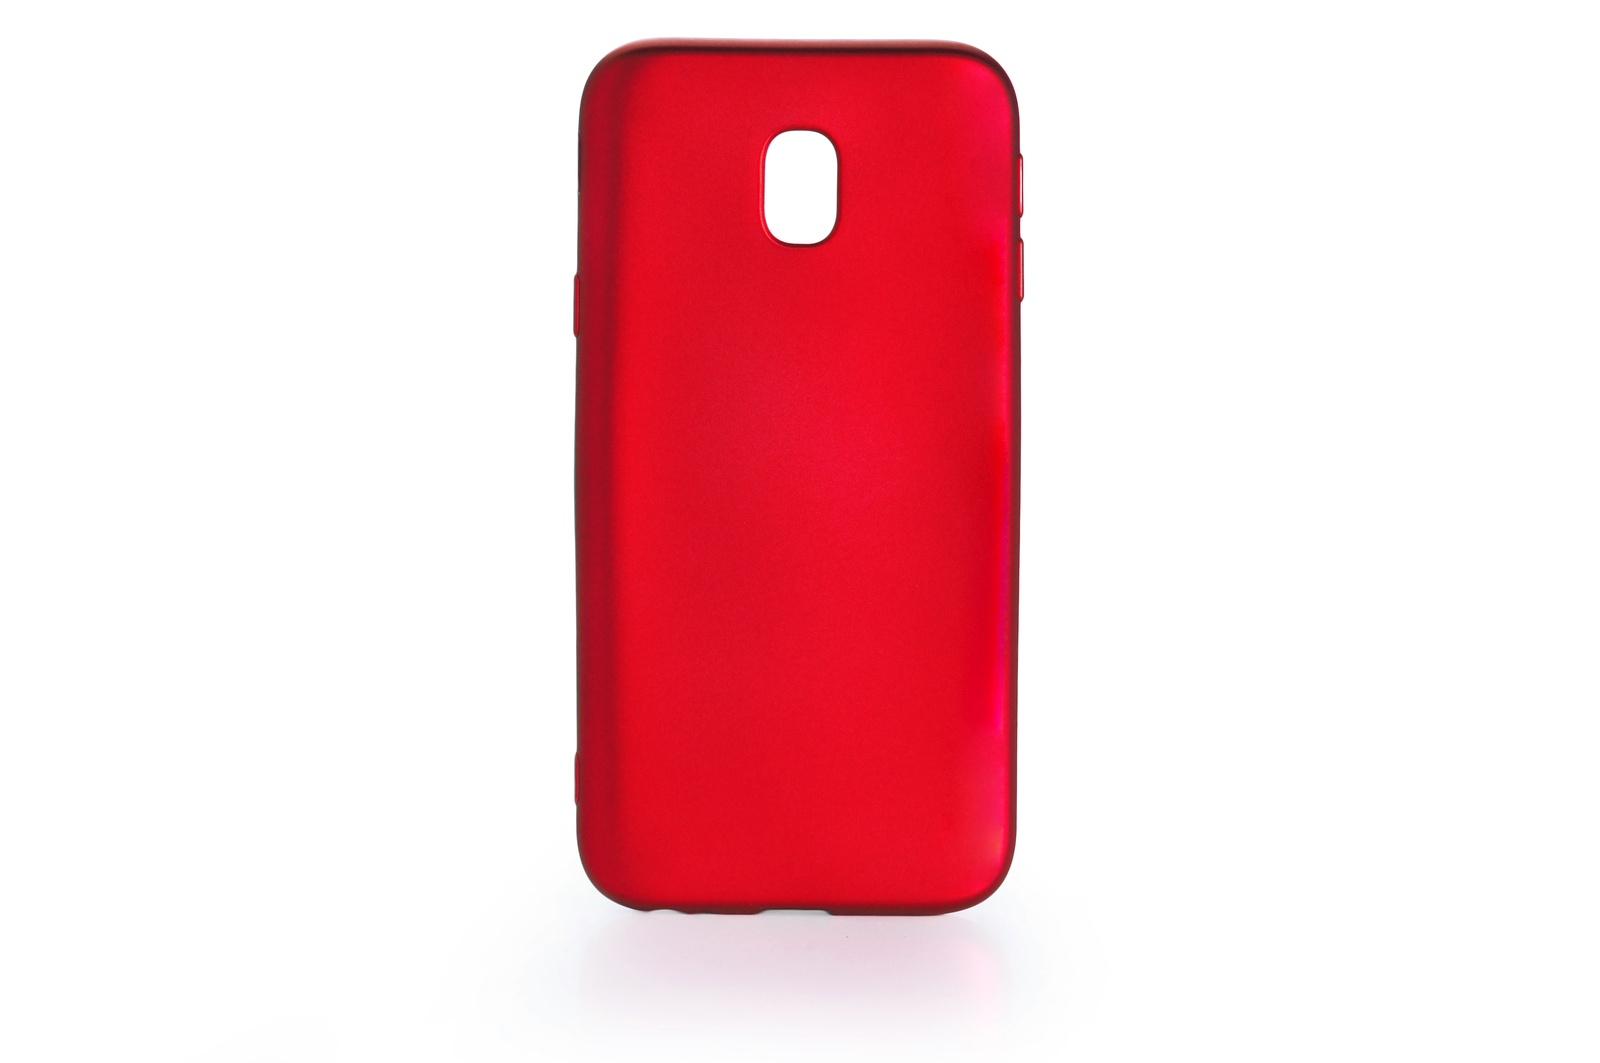 Чехол для сотового телефона Gurdini Чехол накладка силикон Soft Touch для Samsung Galaxy J3 2017 (J 330) , 905000, красный